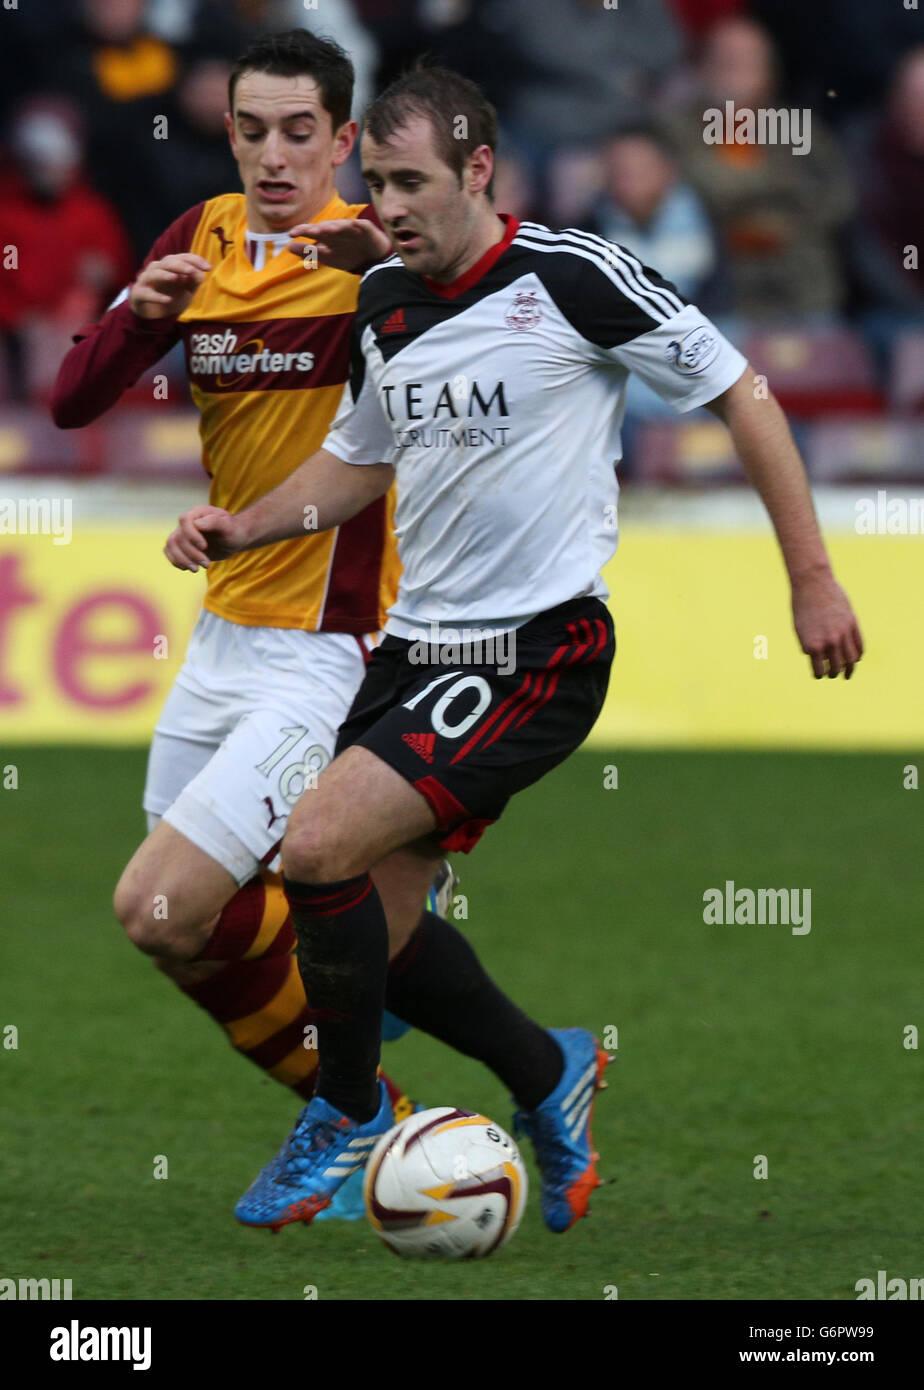 Soccer - Scottish Premiership - Motherwell v Aberdeen - Fir Park Stock Photo